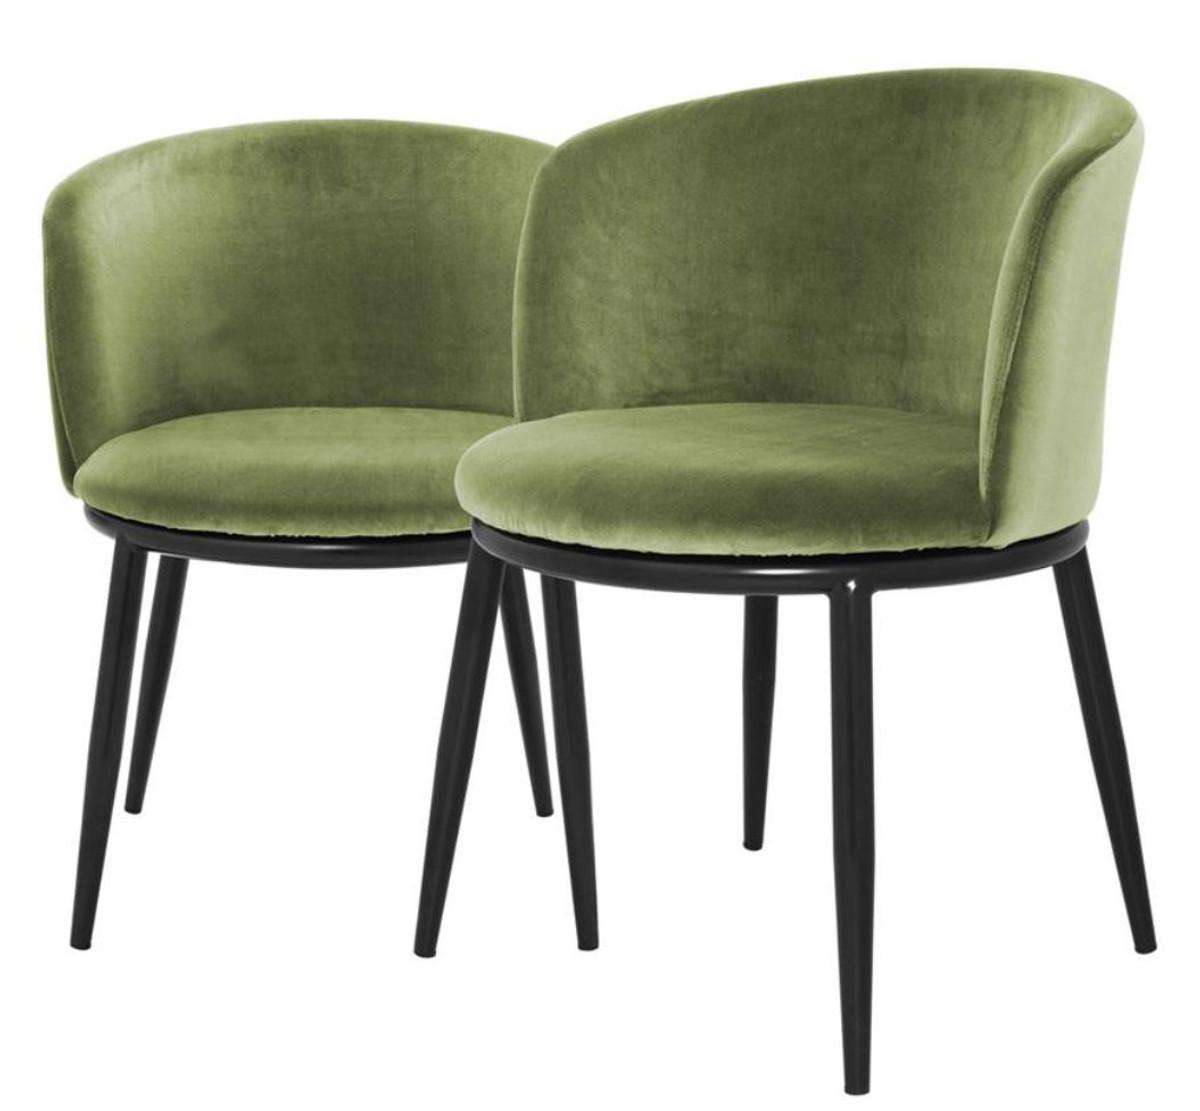 Upscale Dining Room Furniture: Casa Padrino Luxury Dining Chair Set Light Green / Black